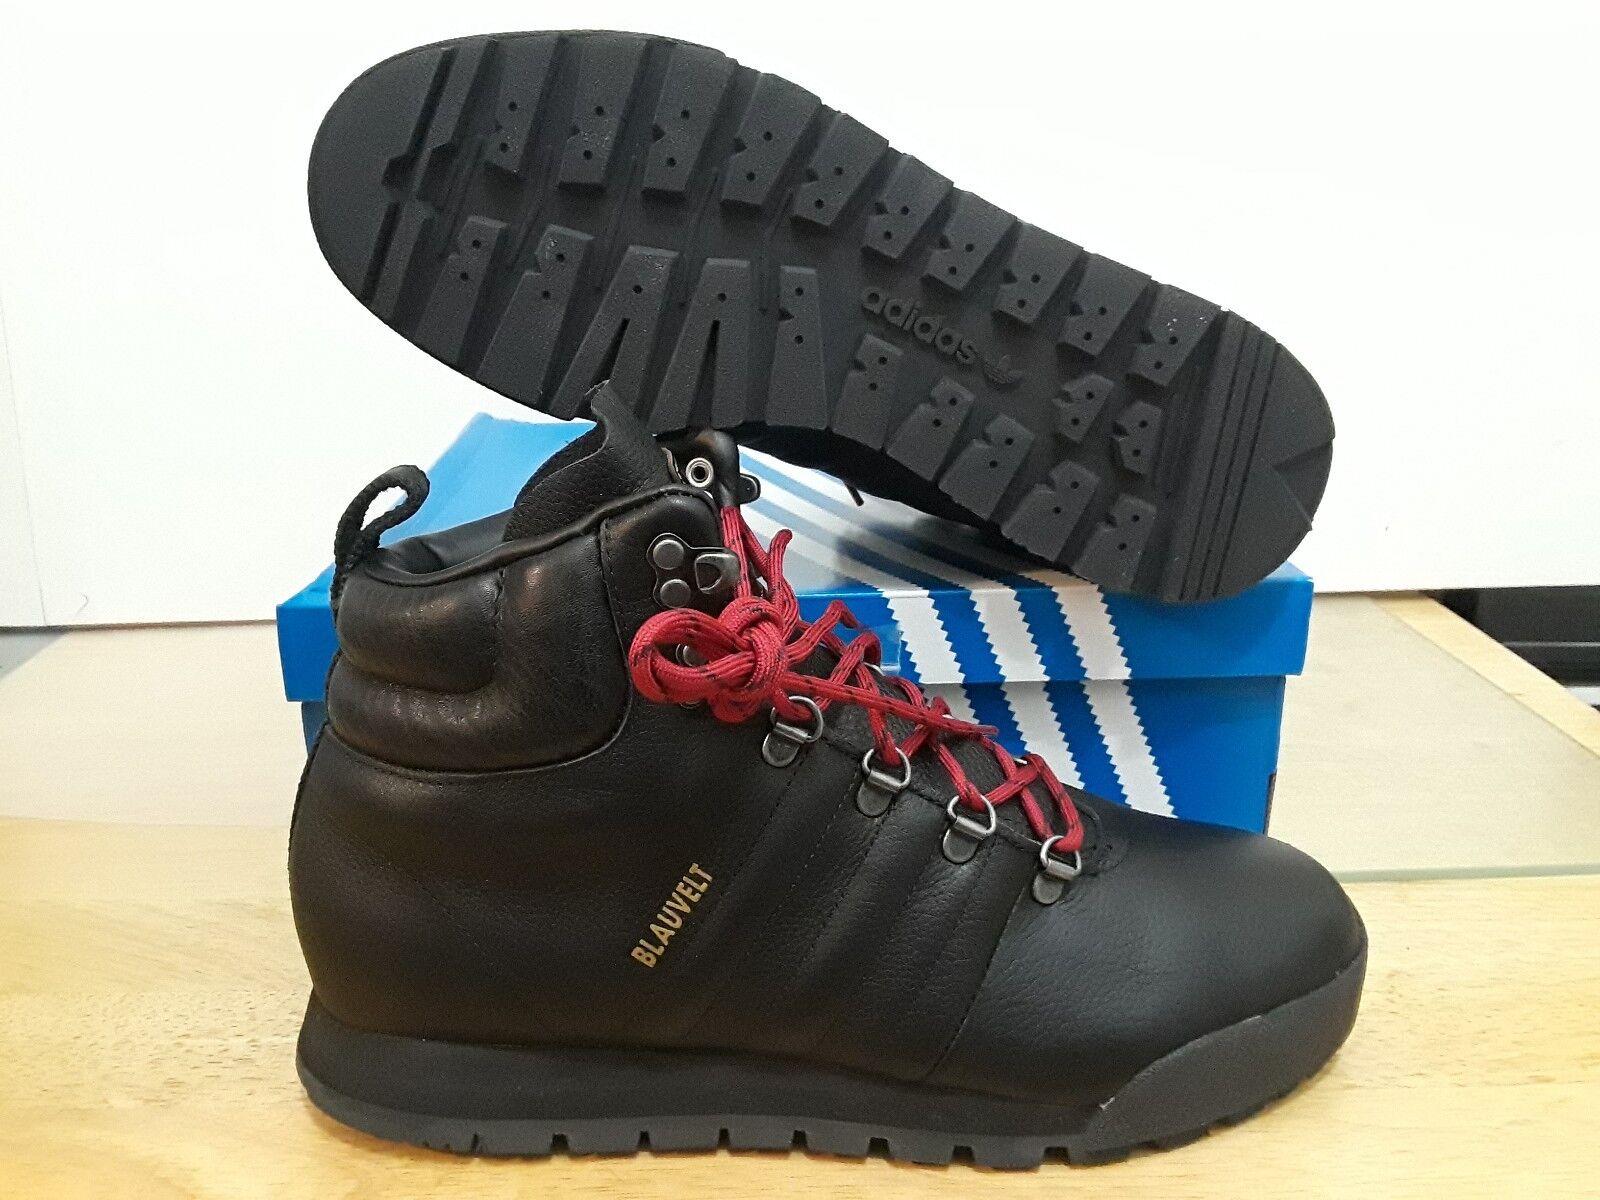 ADIDAS MEN'S JAKE blueVELT BLACK BOOT   G56462 SIZE  9